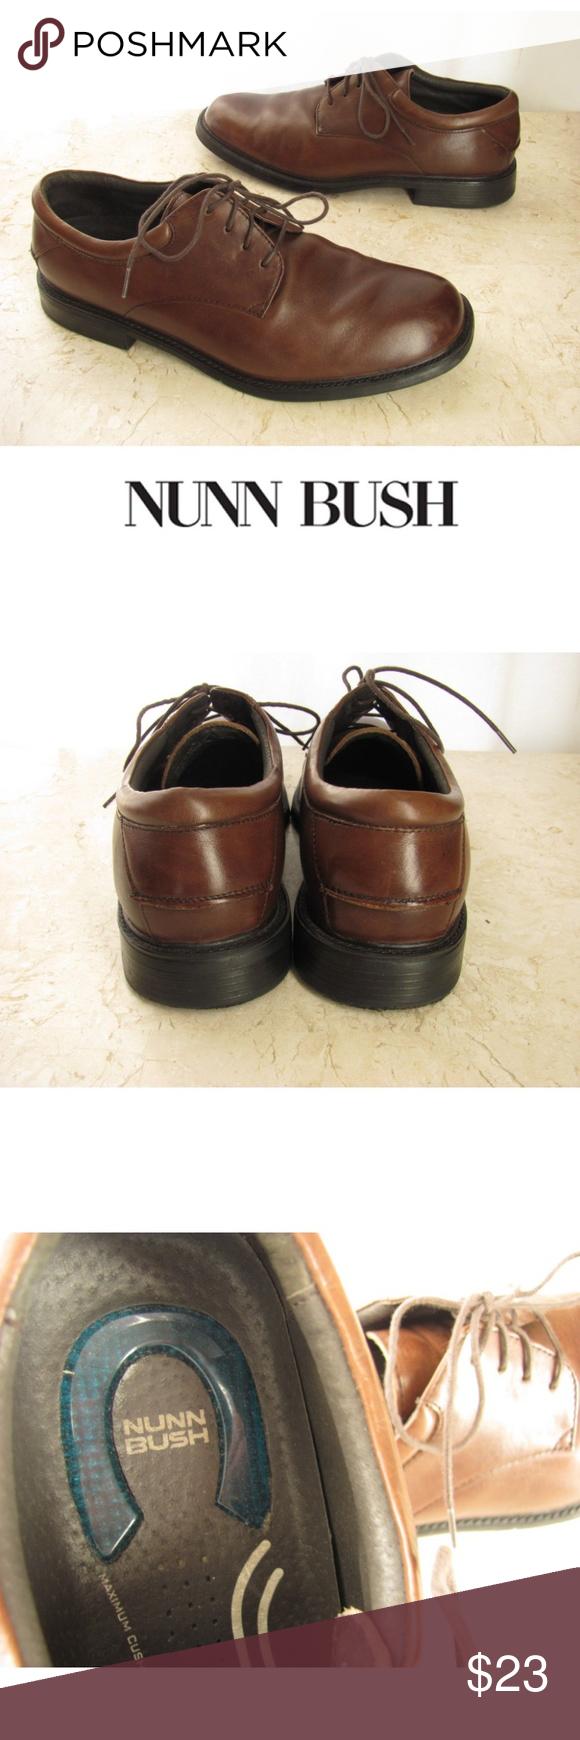 1372a7655f9b6b Nunn Bush Mens 10 M Brown Oxford Shoes Comfortable Nunn Bush mens 10 M shoes.  These Nunn Bush Comfort Gel oxford shoes will have your feet feeling happy  all ...